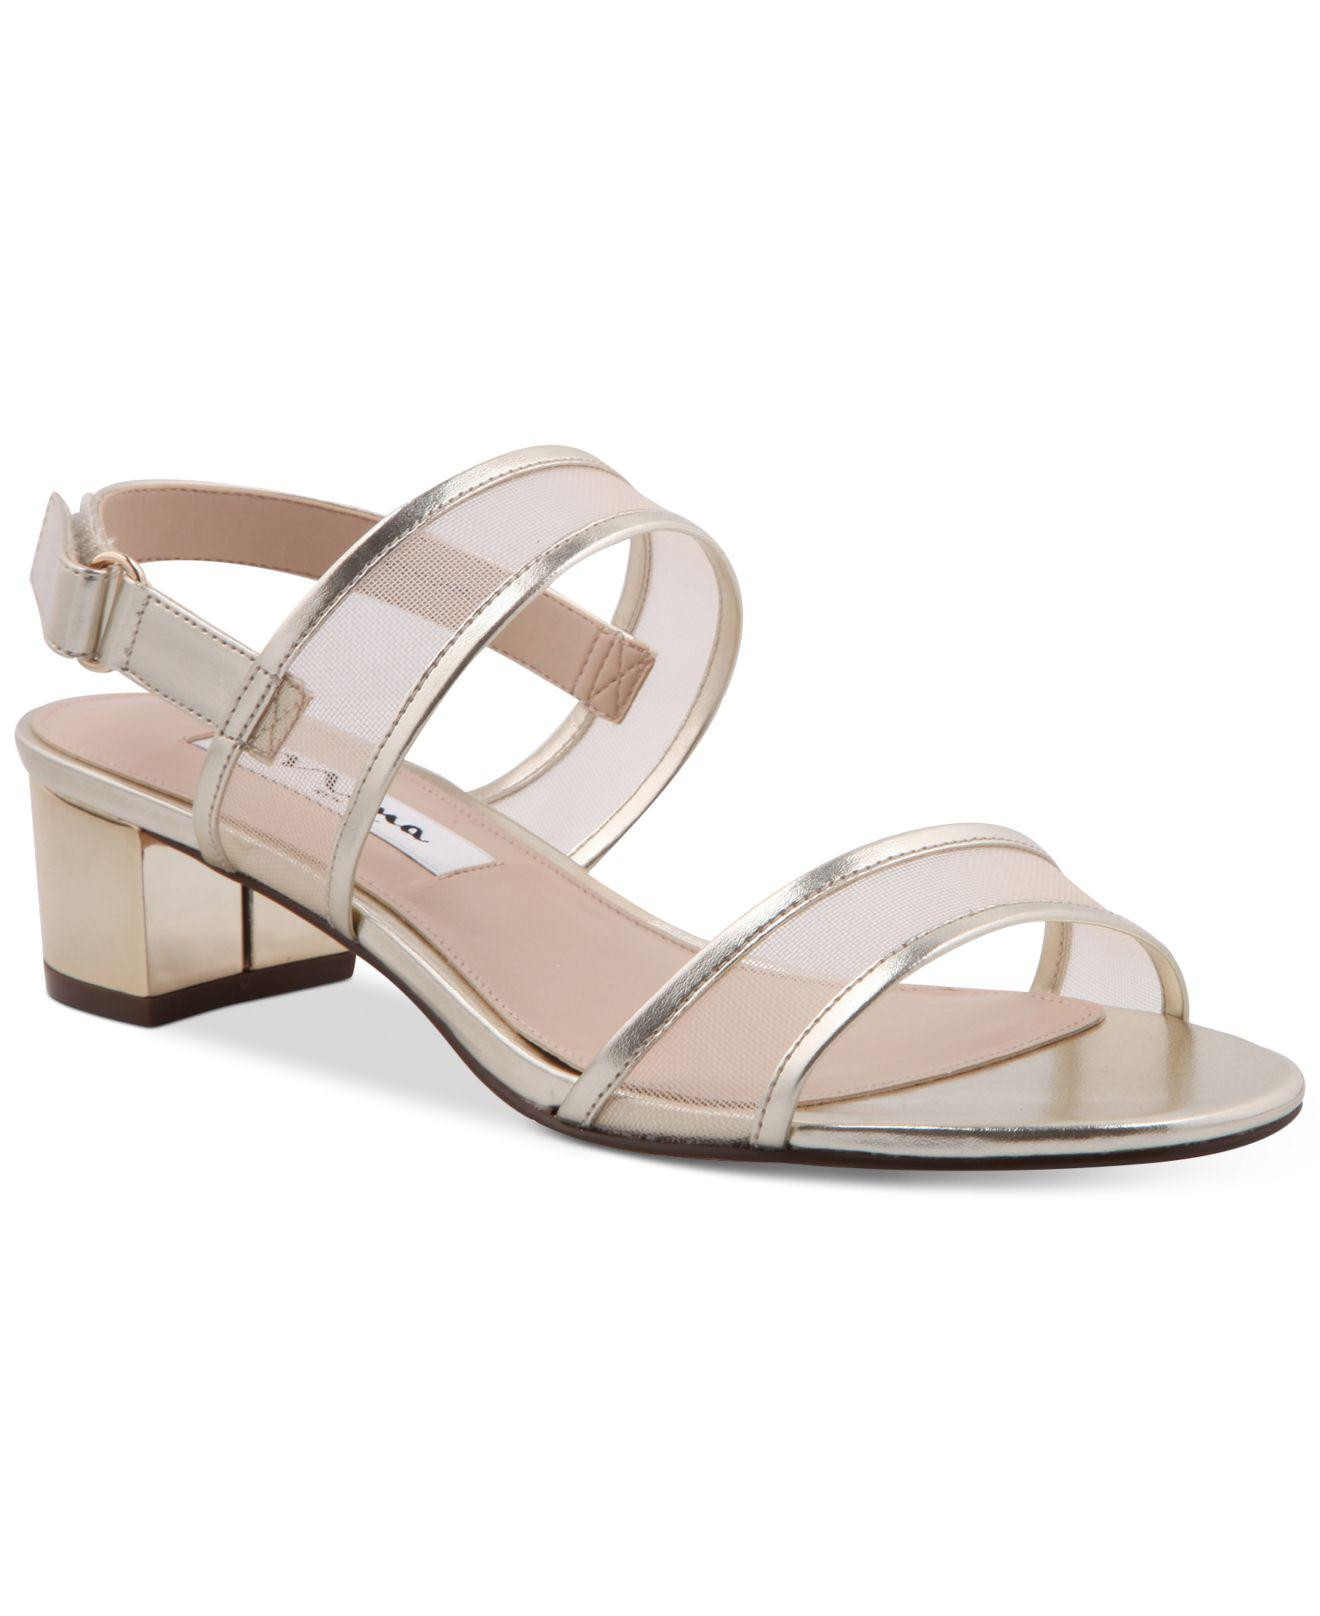 Nina Ganice Mesh & Satin Block Heel Dress Sandals HDDezeY0y